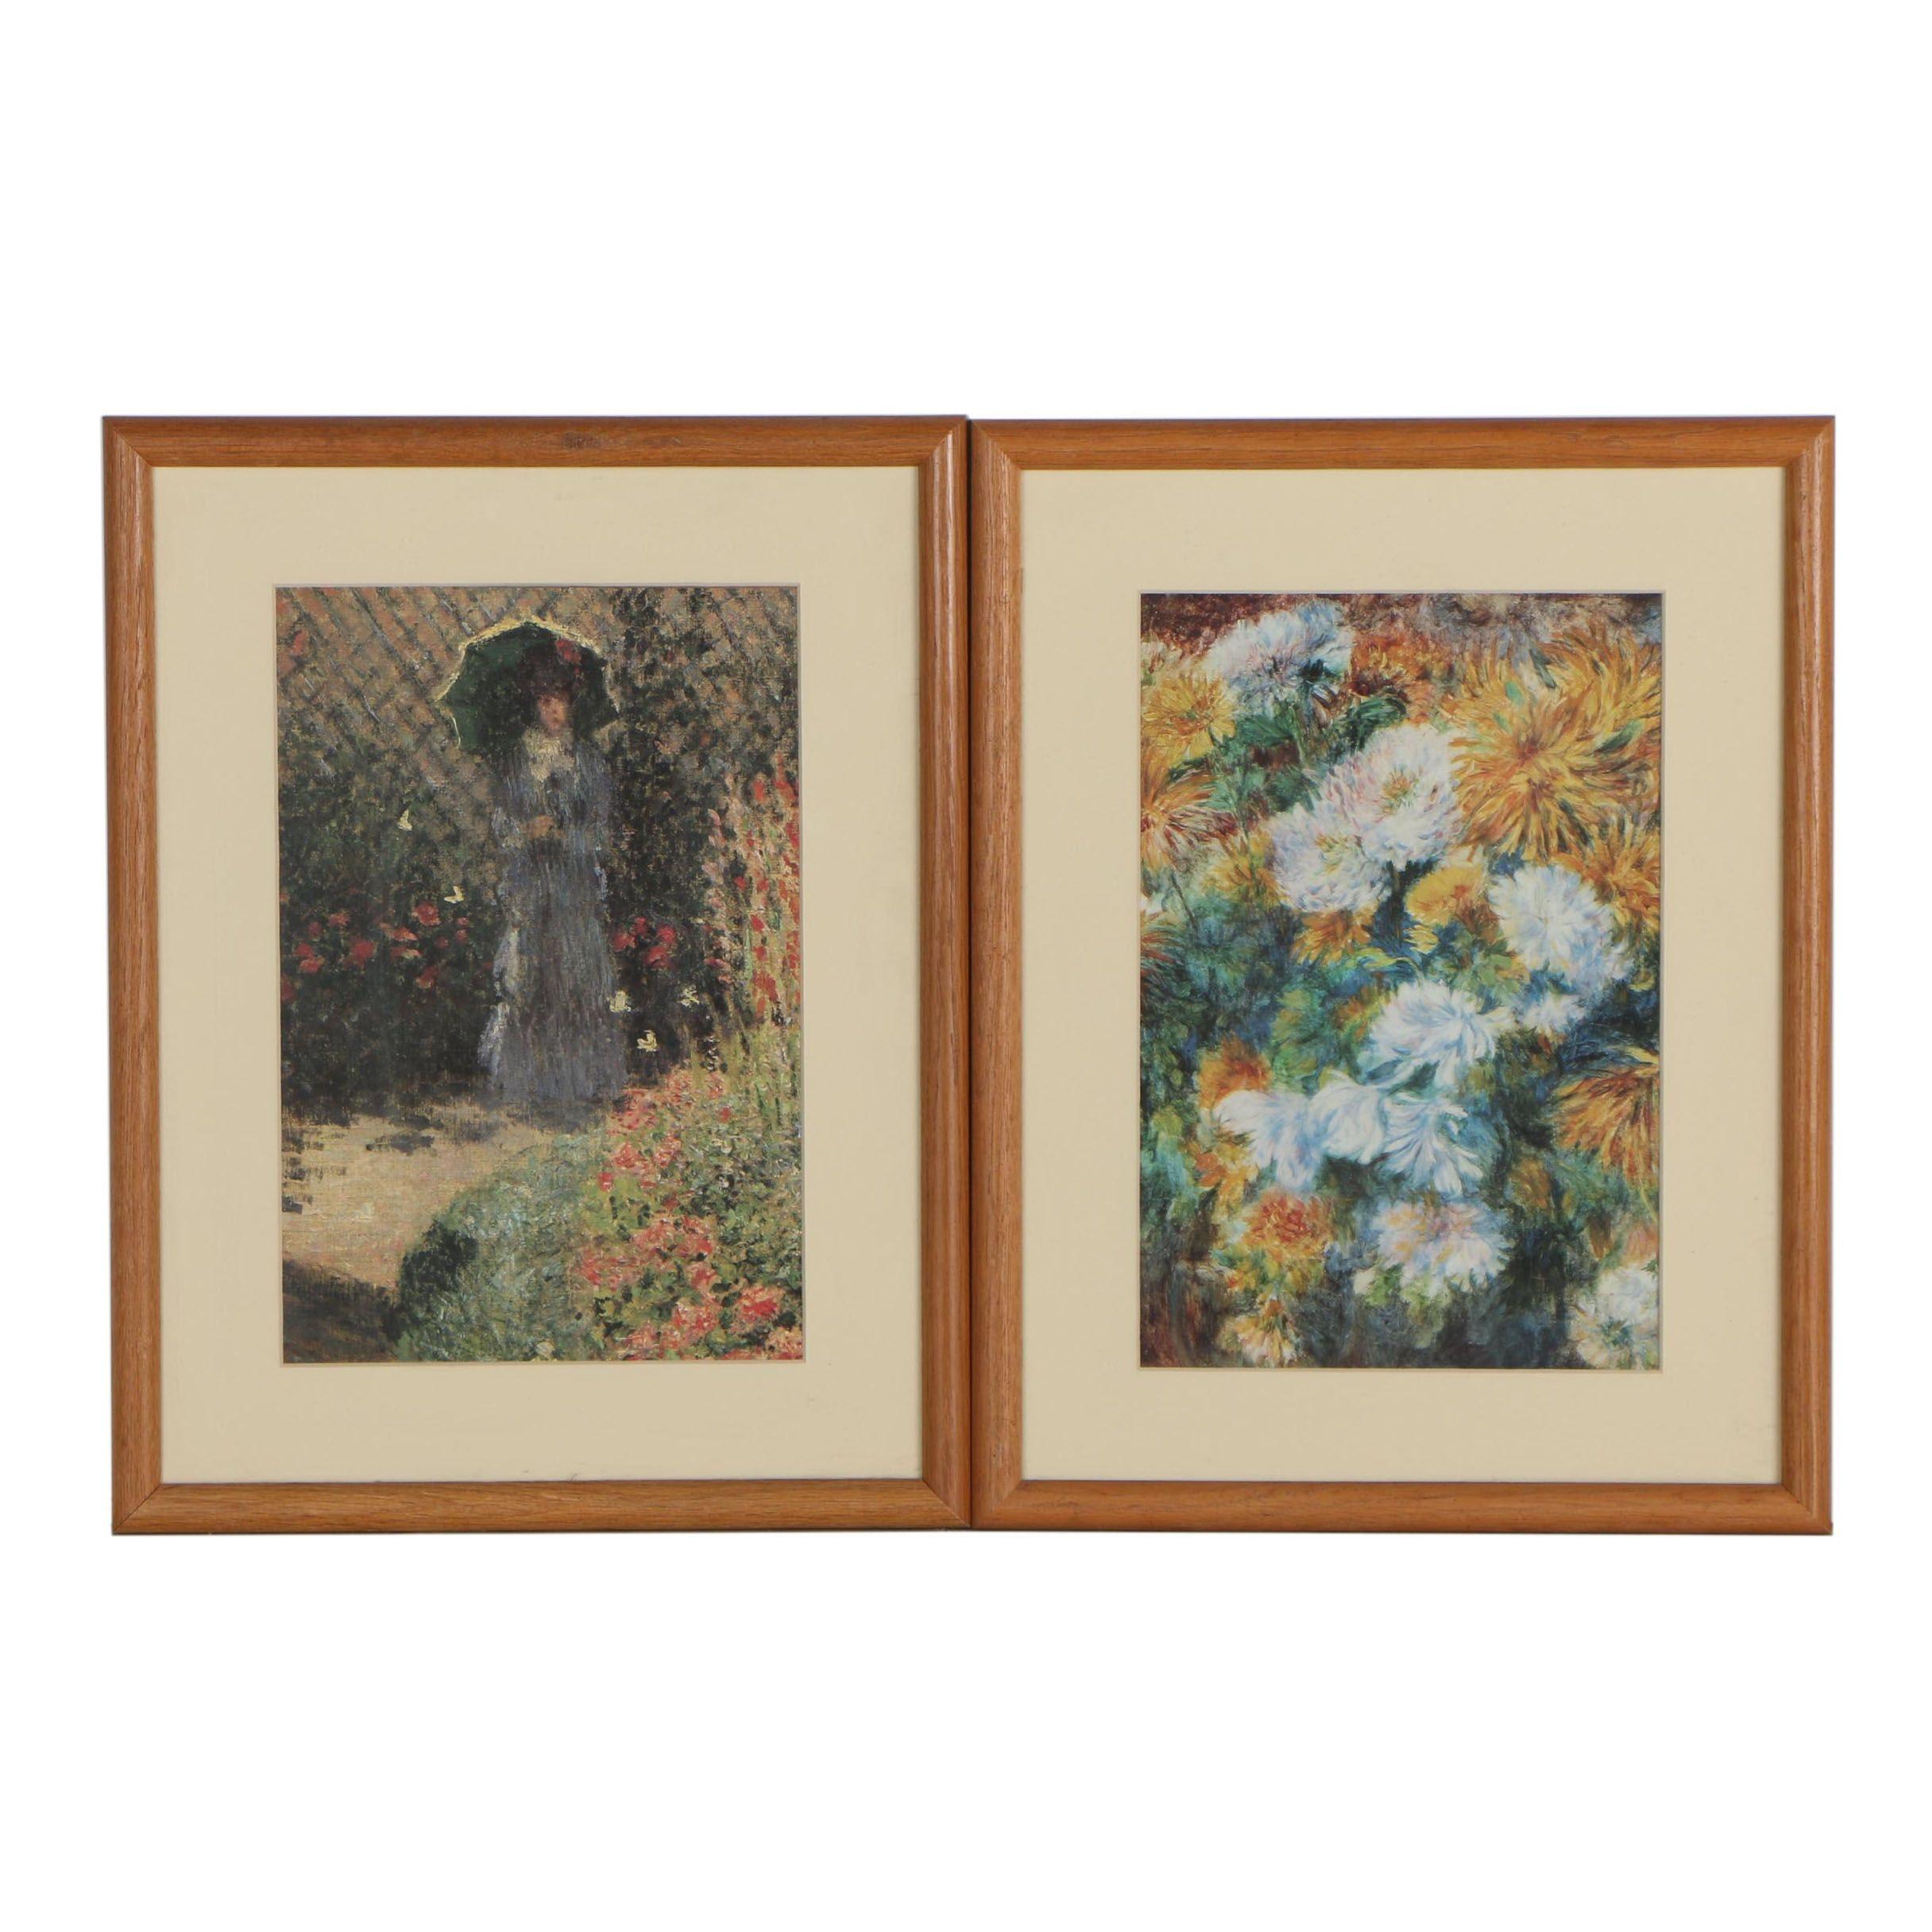 Offset Lithographs after Monet and Renoir